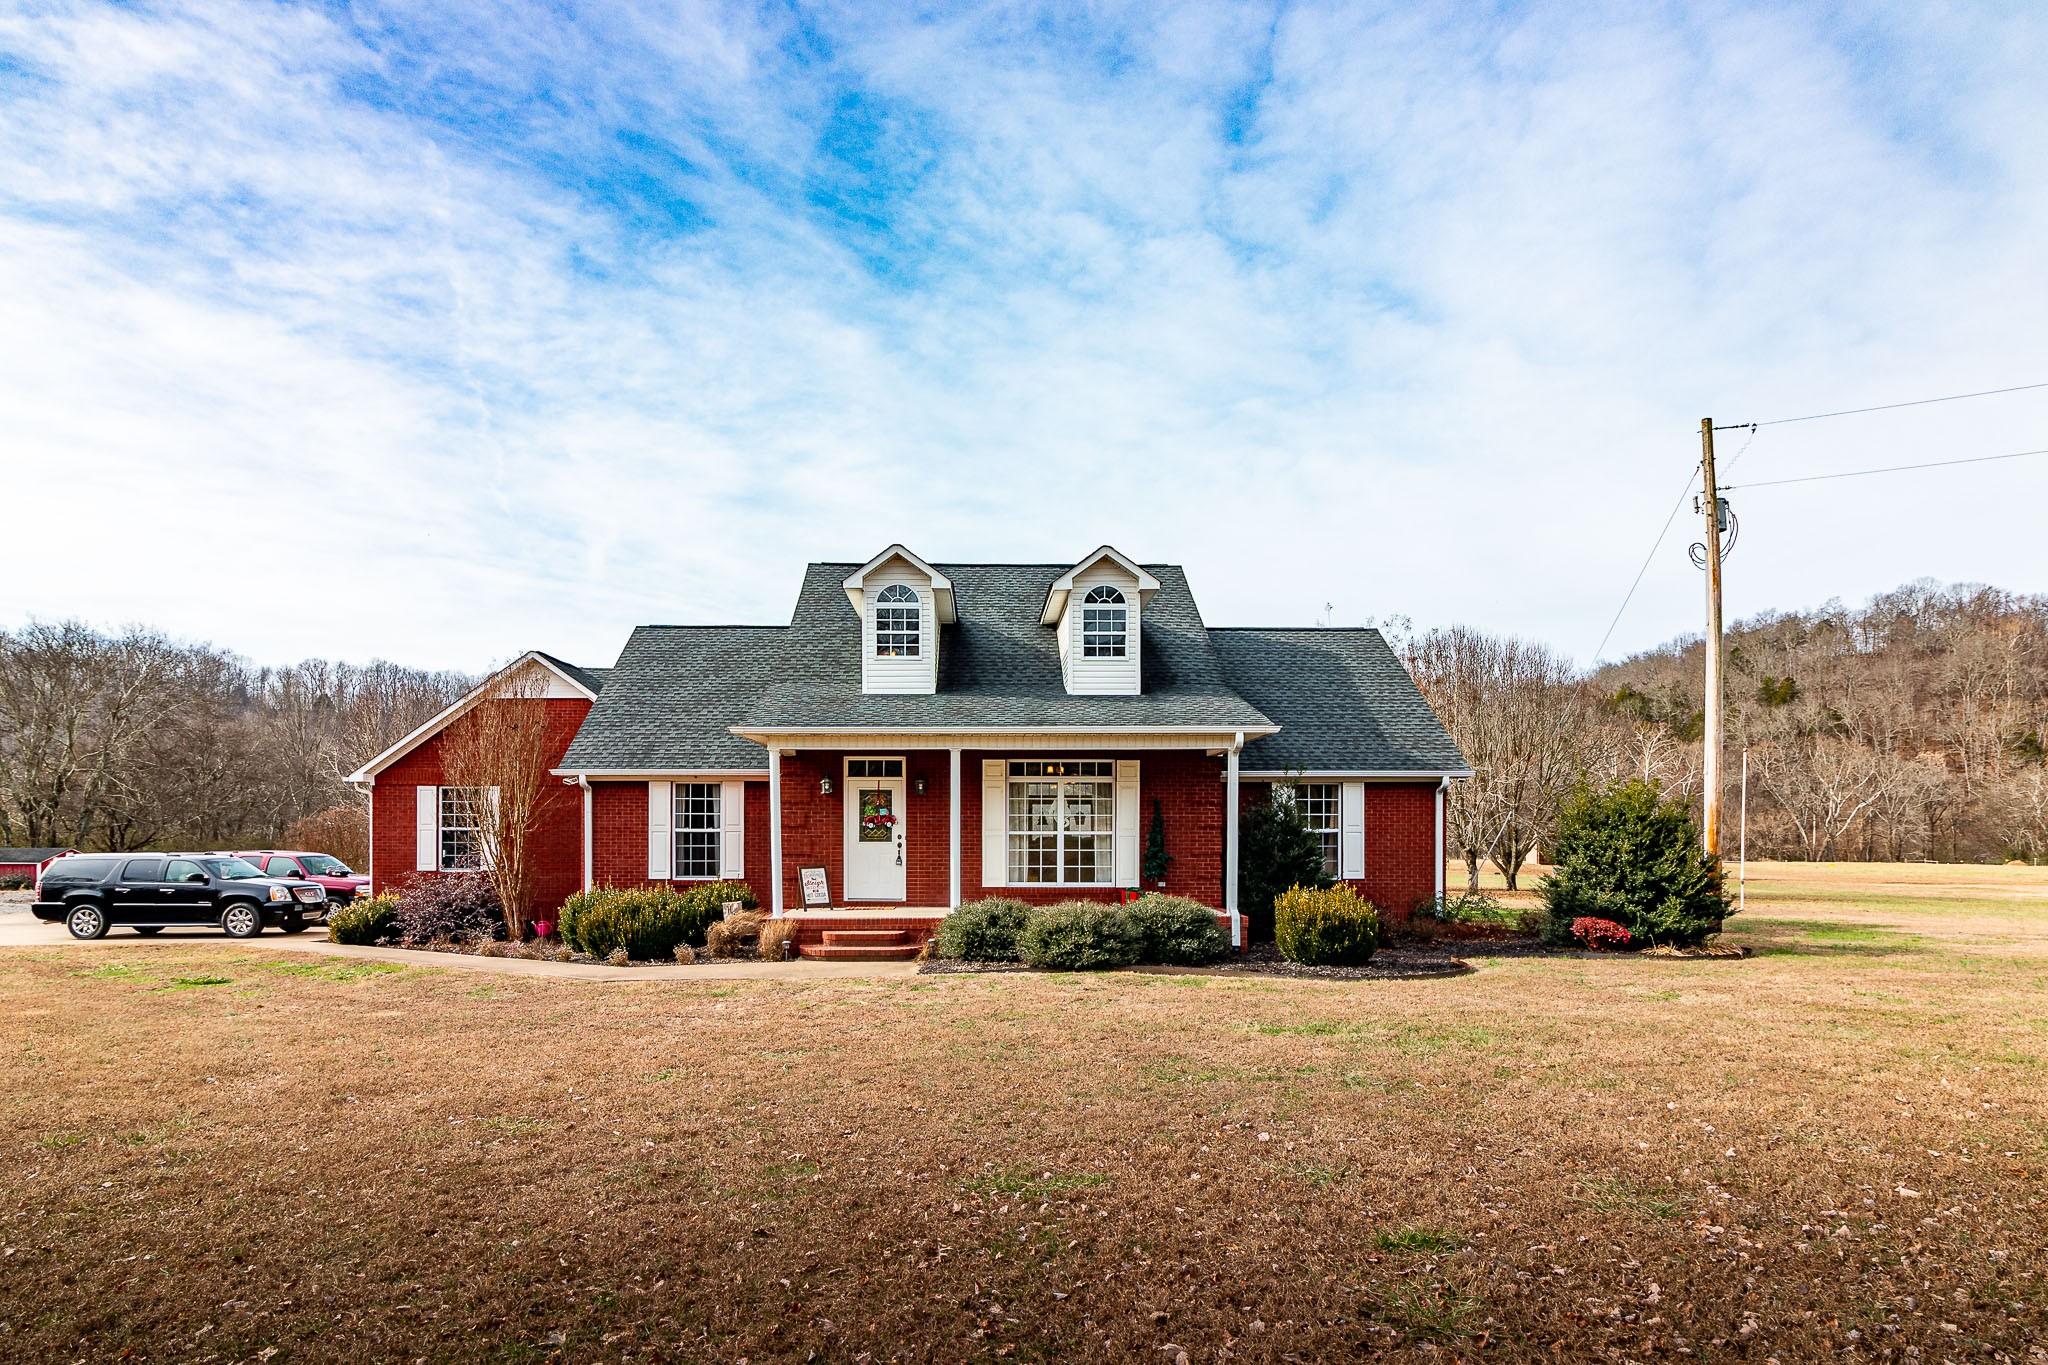 636 Agnew Rd, Pulaski, TN 38478 - Pulaski, TN real estate listing